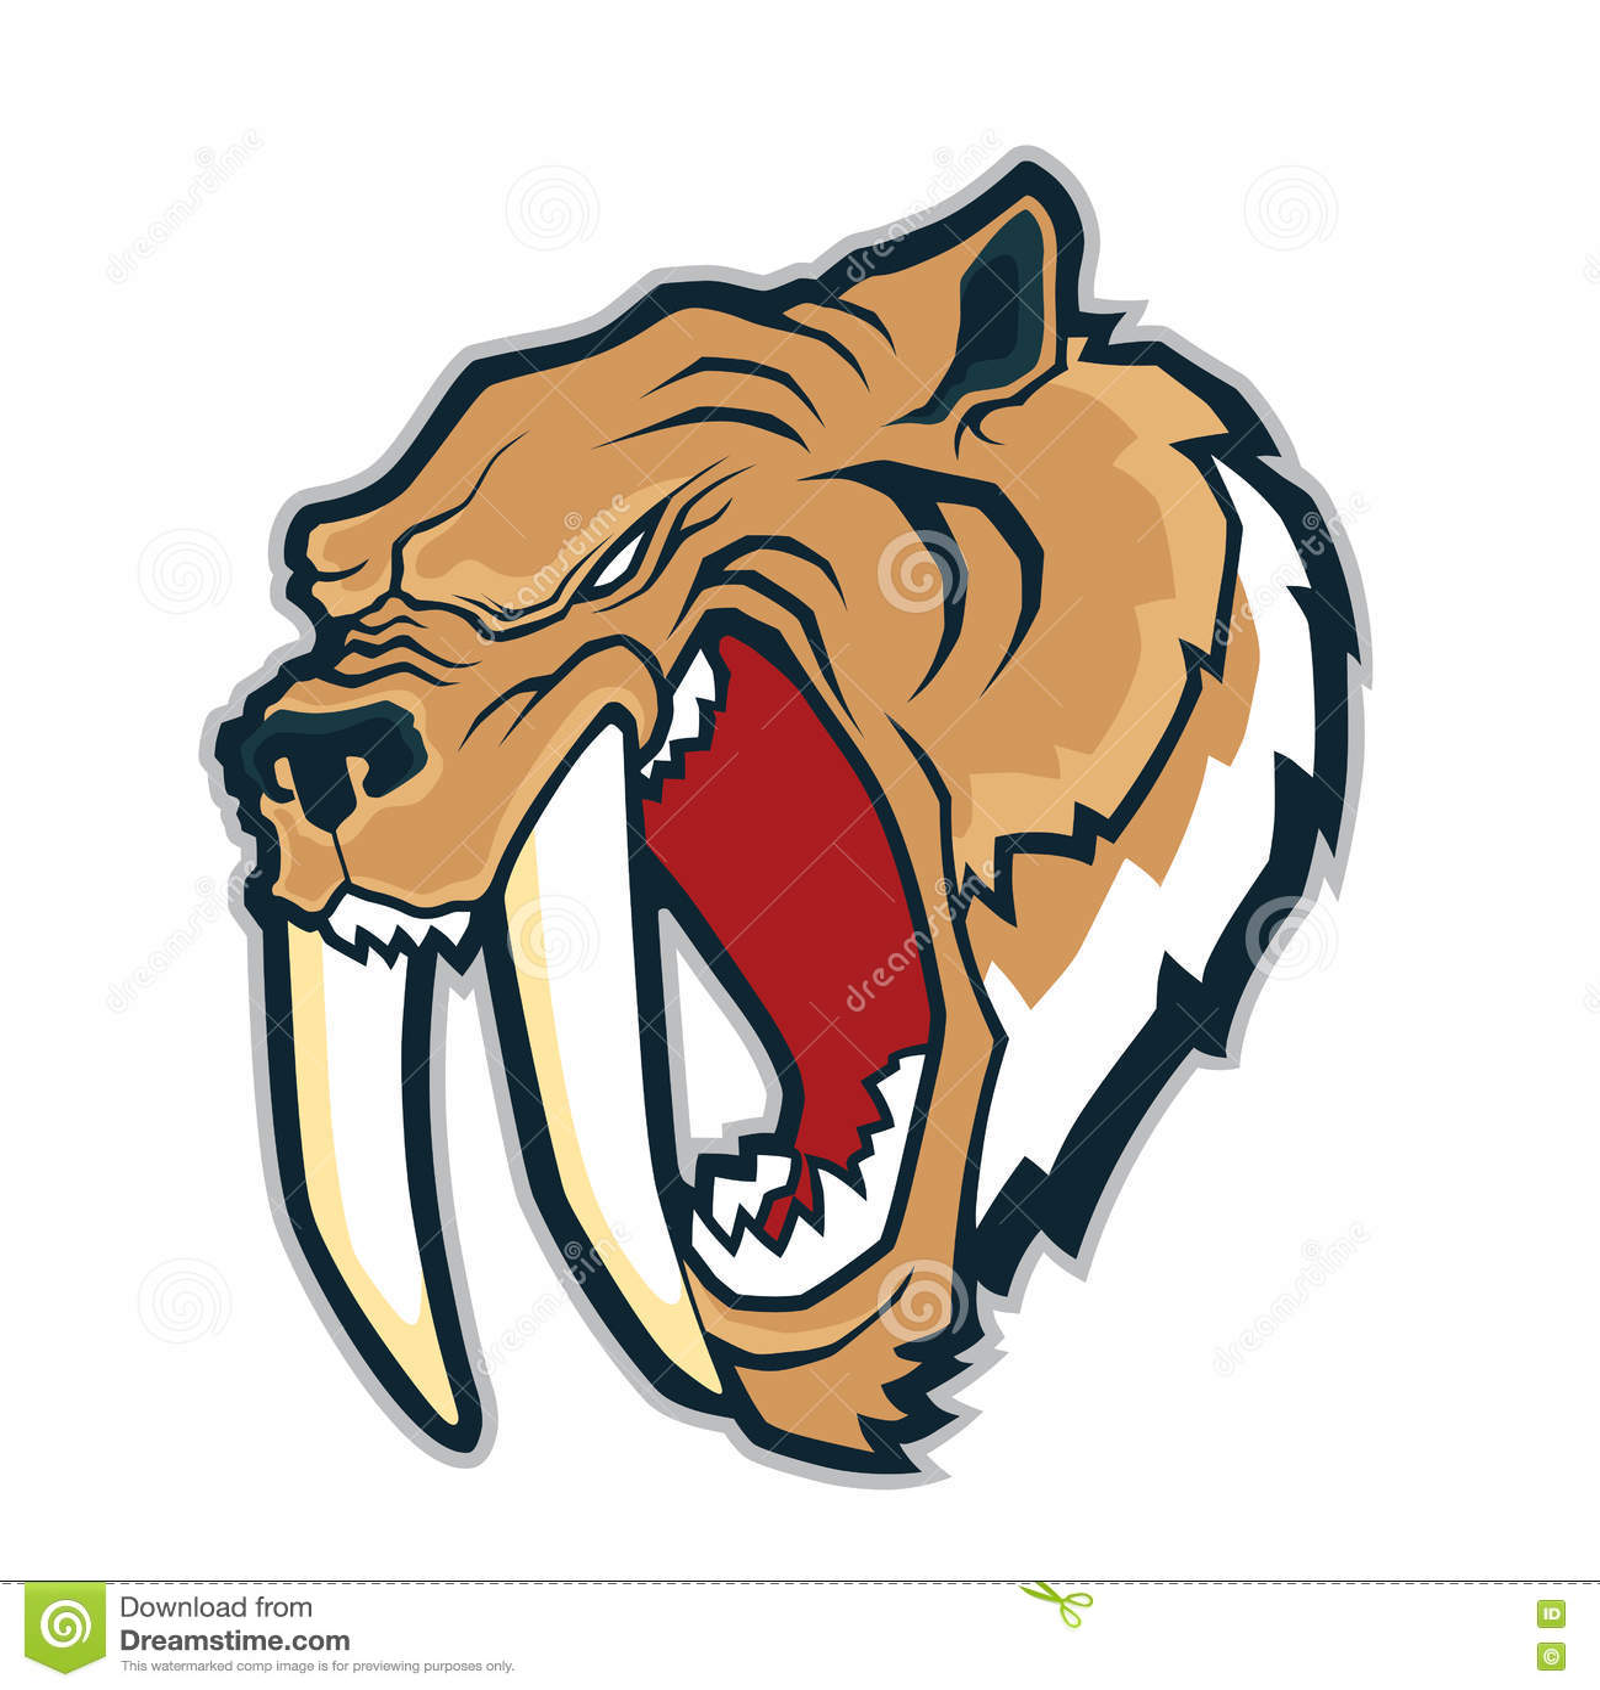 78215b0a4 Clipart picture of a sabertooth tiger head cartoon mascot character